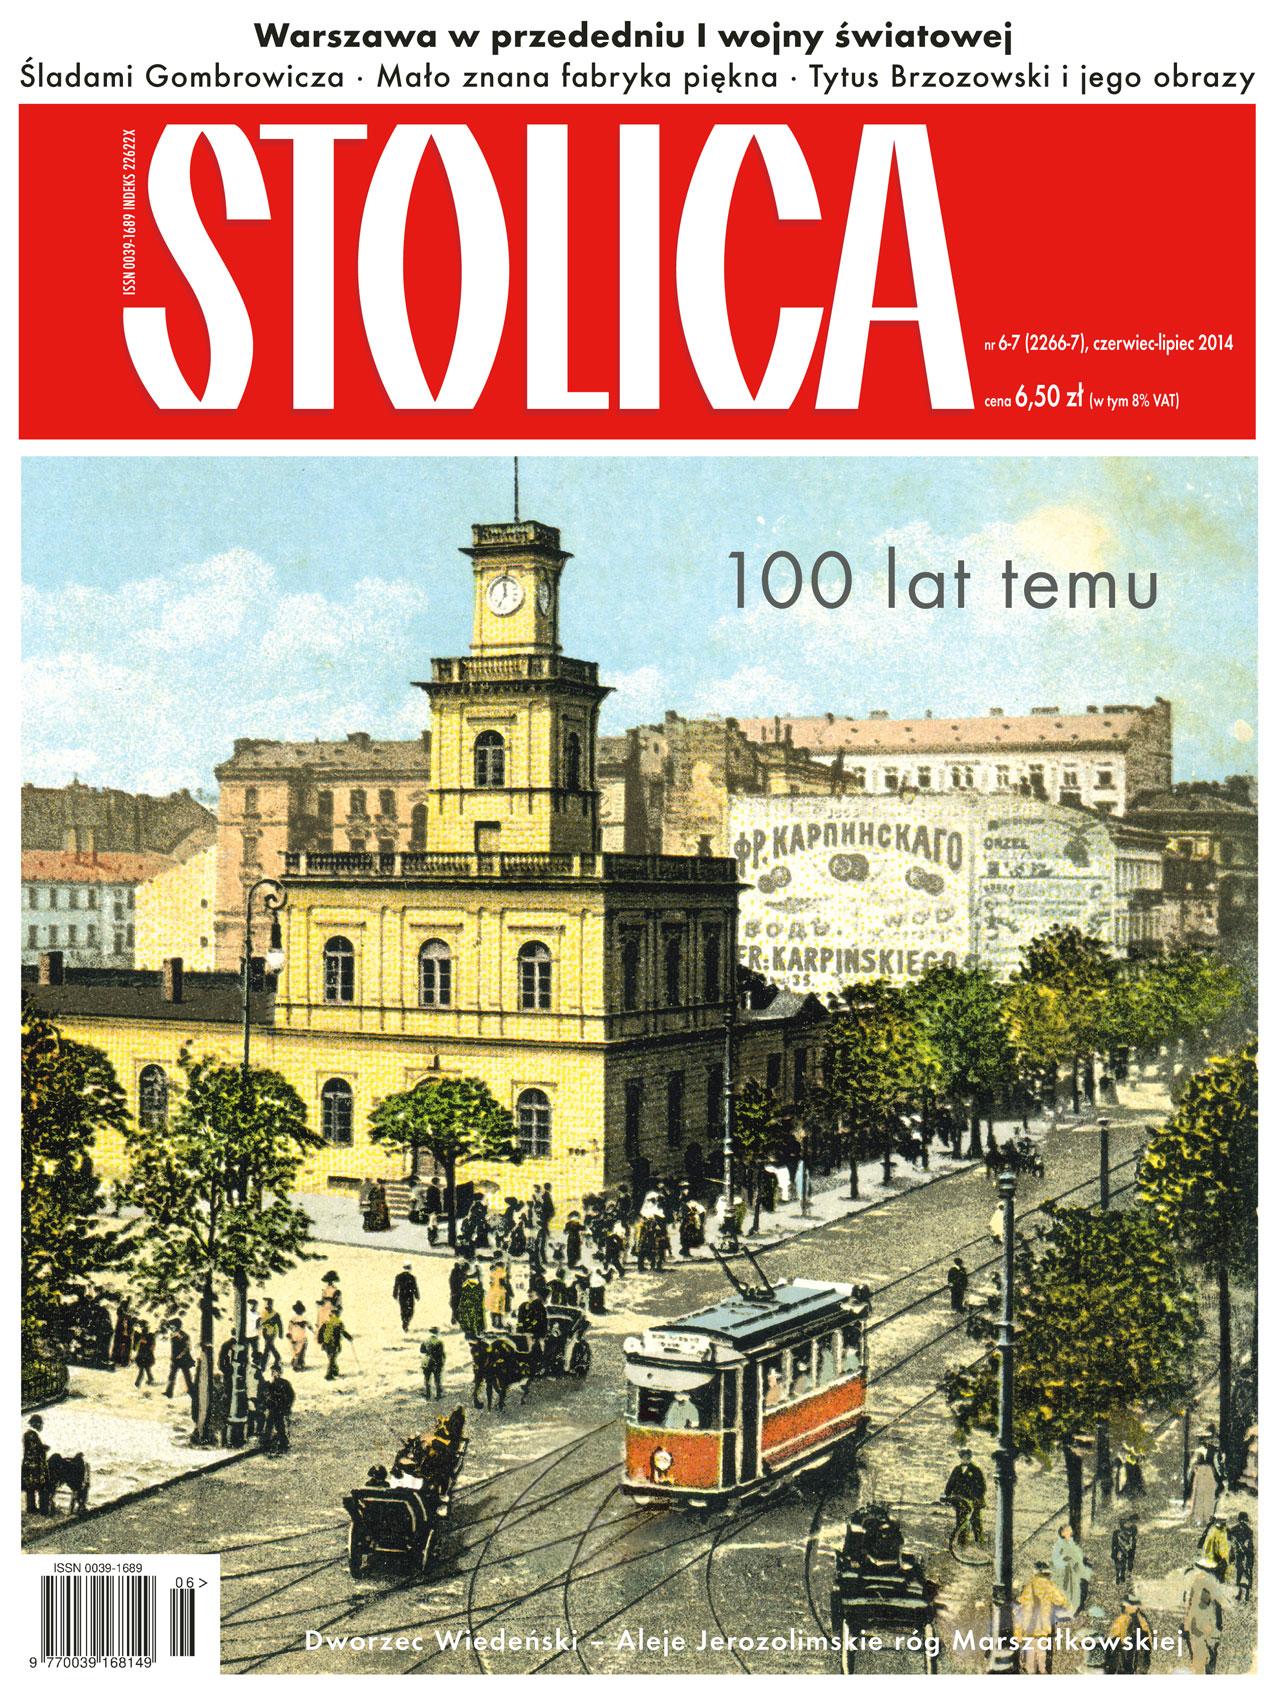 Stolica_04-2014_okladka